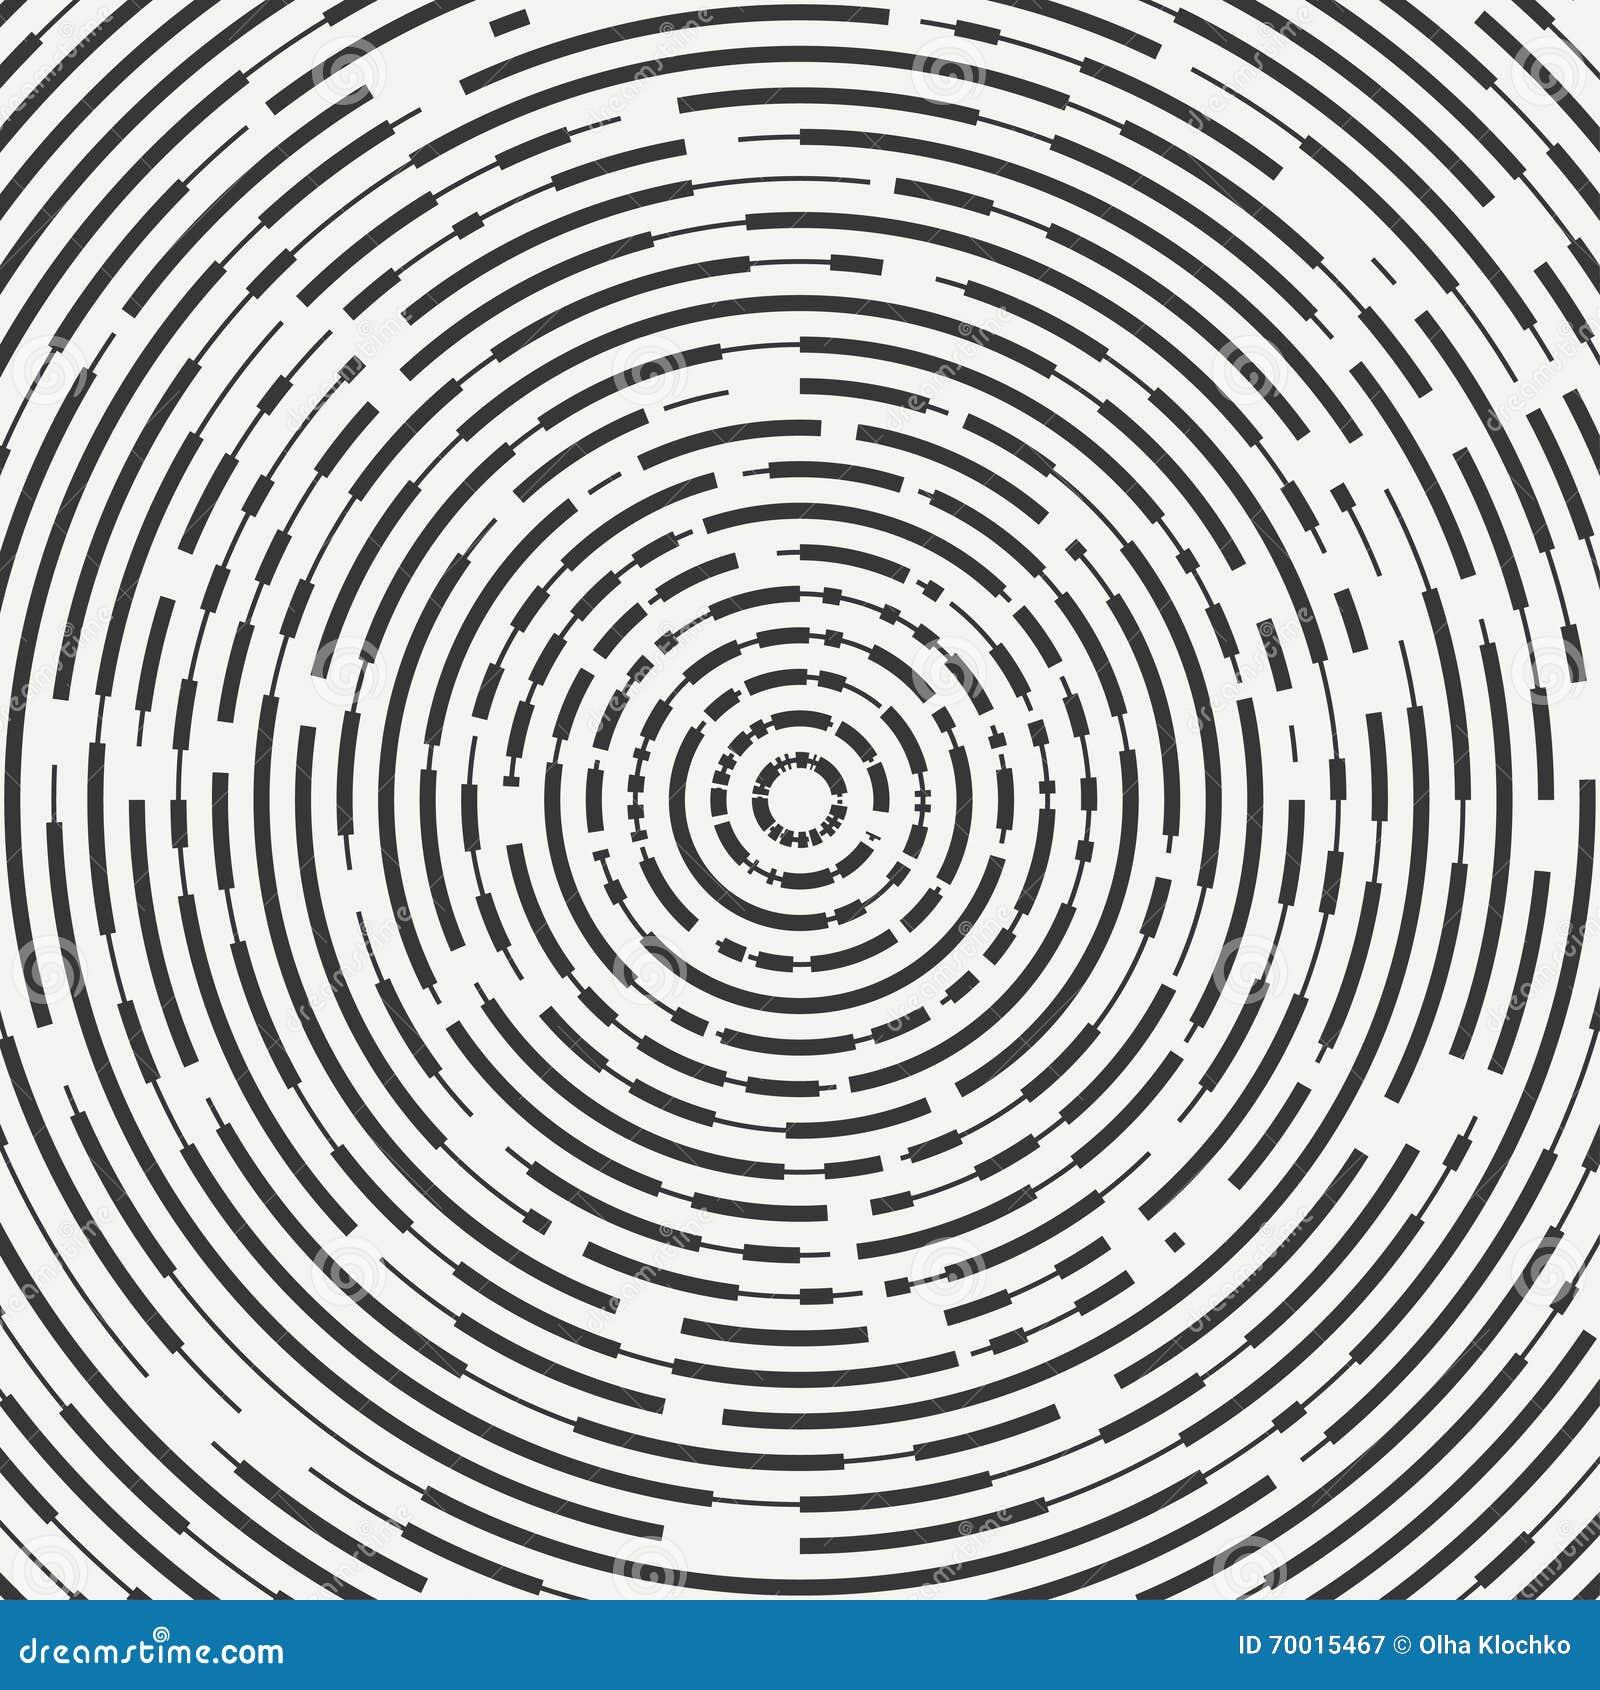 abstract design circle sector - photo #9